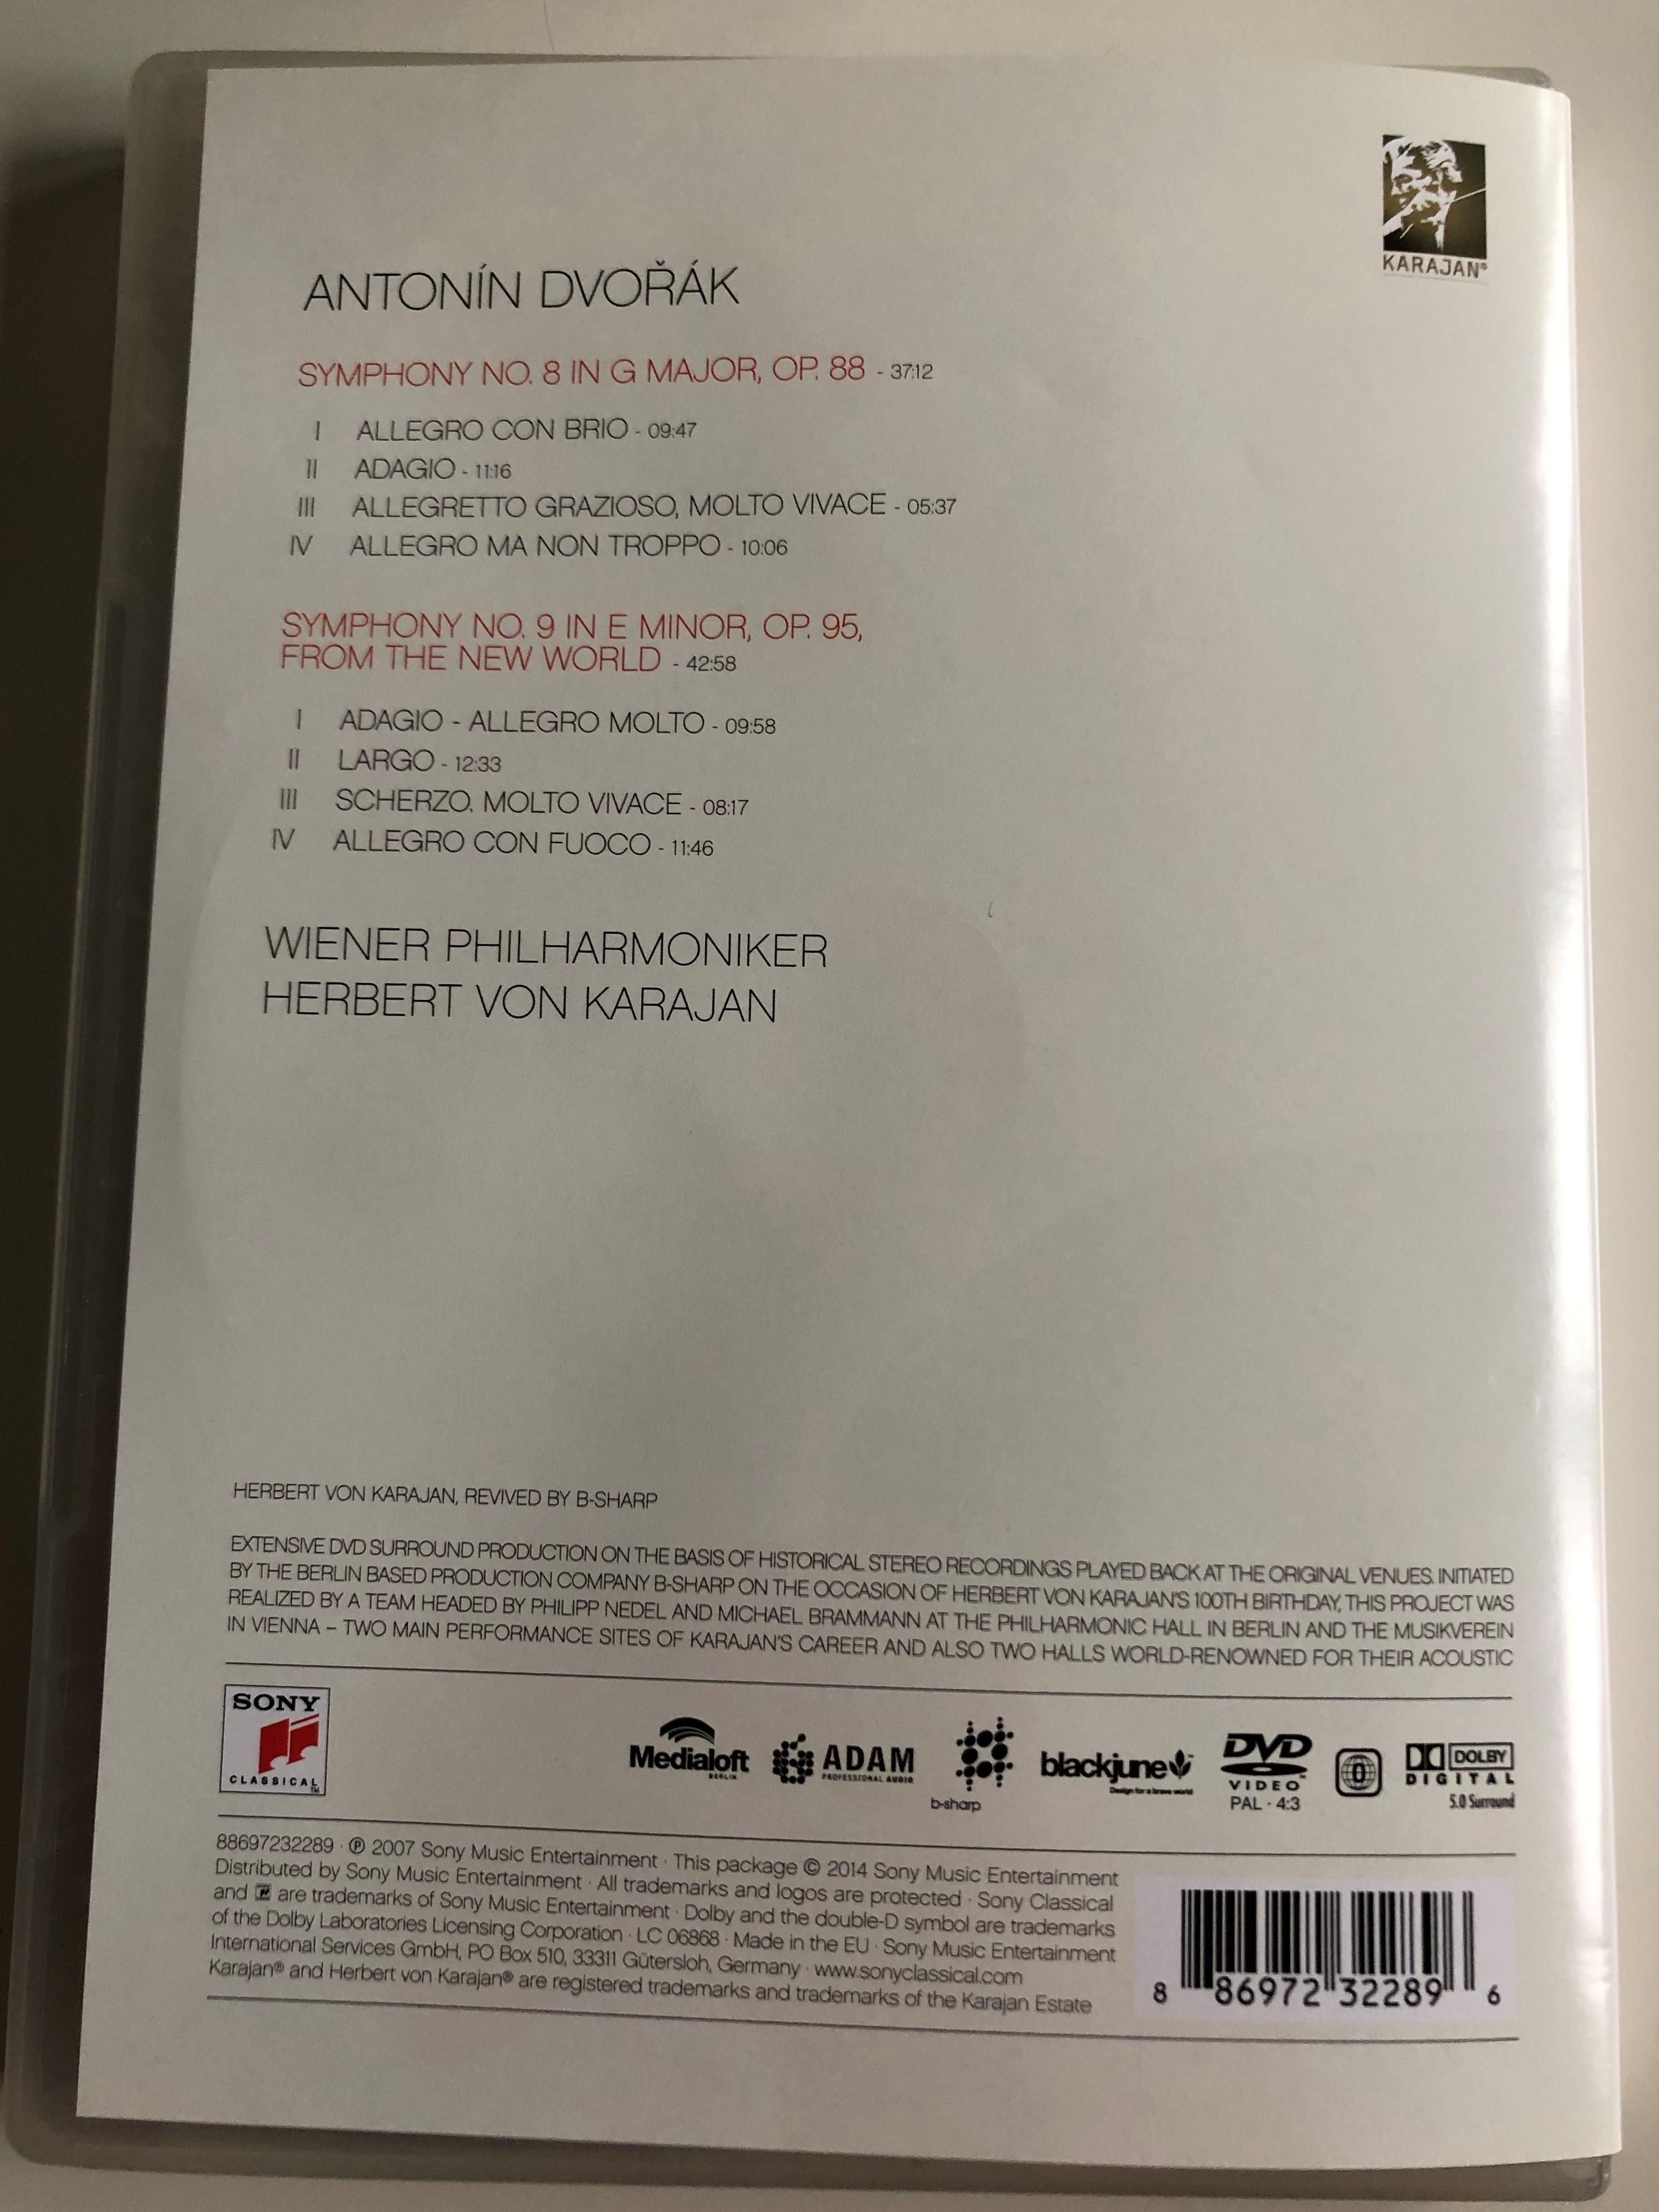 anton-n-dvo-k-symphonies-8-9-dvd-2014-herbert-von-karajan-wiener-philharmoniker-new-stereo-and-surround-sound-sony-classical-2-.jpg